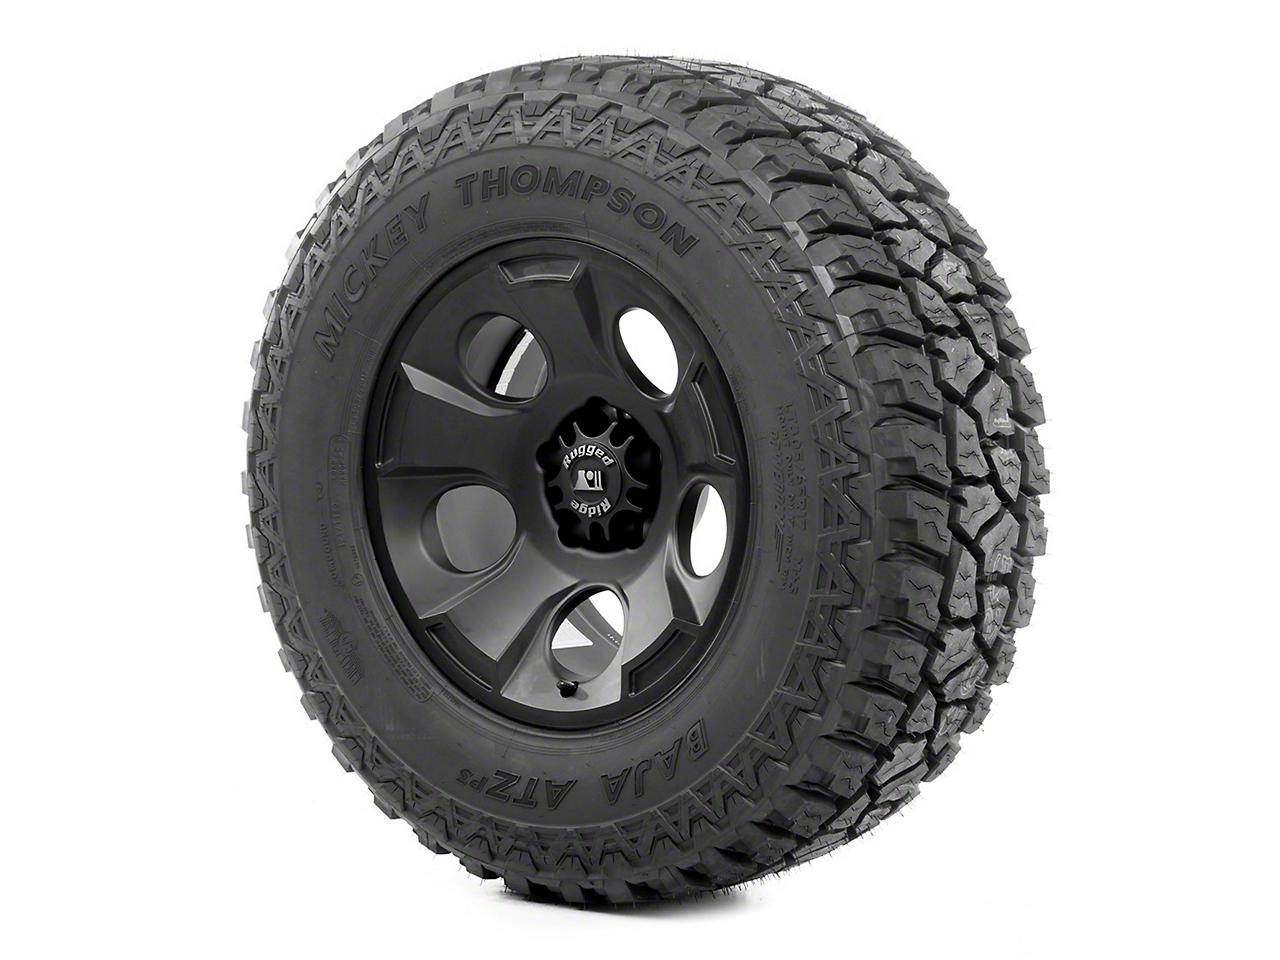 Rugged Ridge Drakon Wheel 17x9 Black Satin and Mickey Thompson ATZ 305/65R17 Tire (07-12 Wrangler JK)